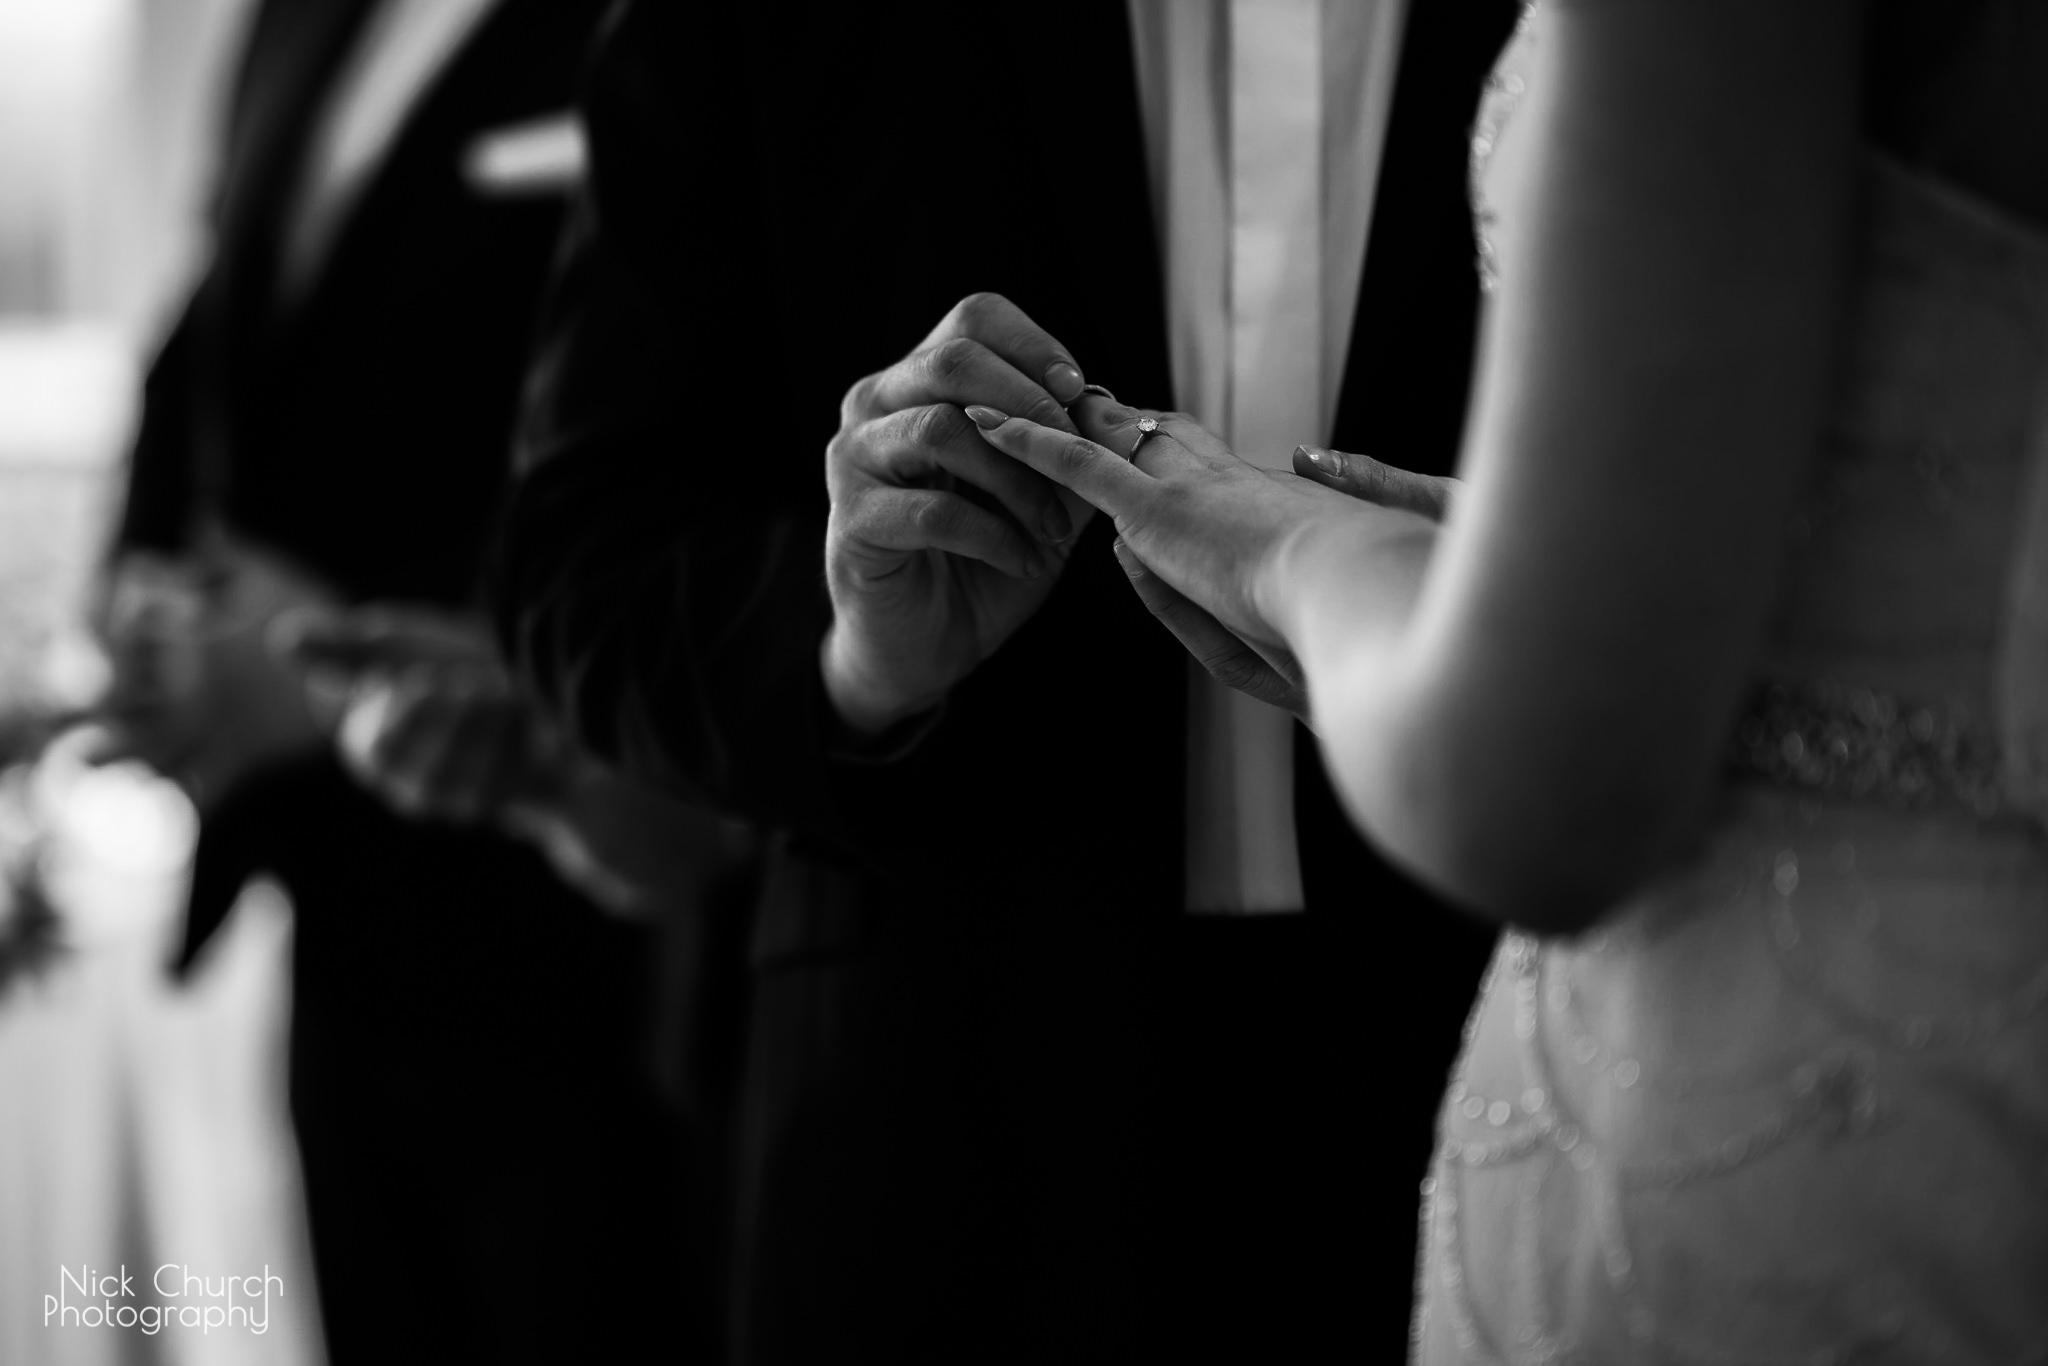 NC-20180317-stacy-and-mike-wedding-0530.jpg